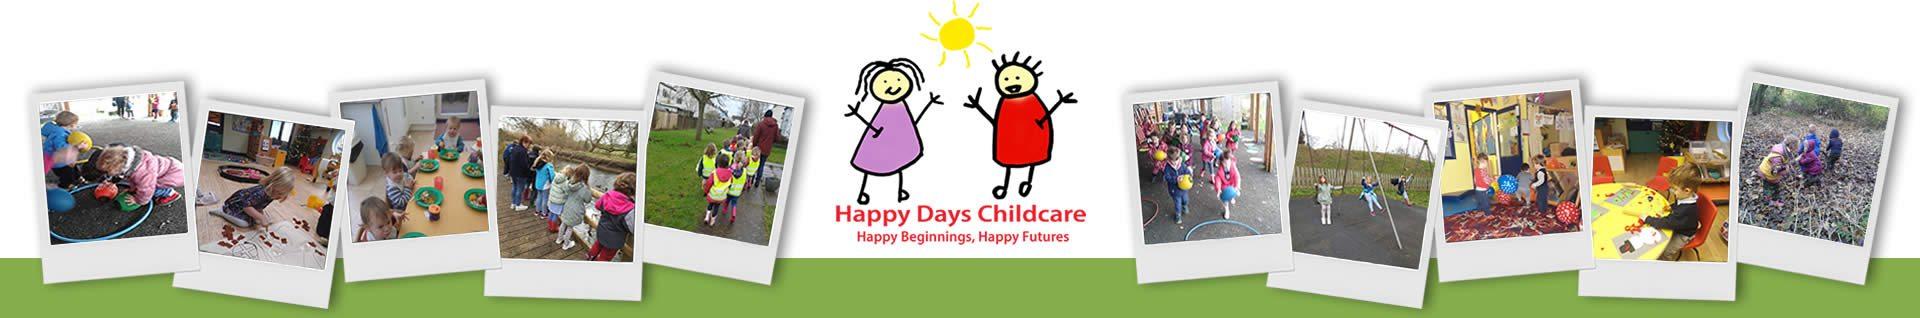 Happy Days Childcare Nursery Photo Gallery